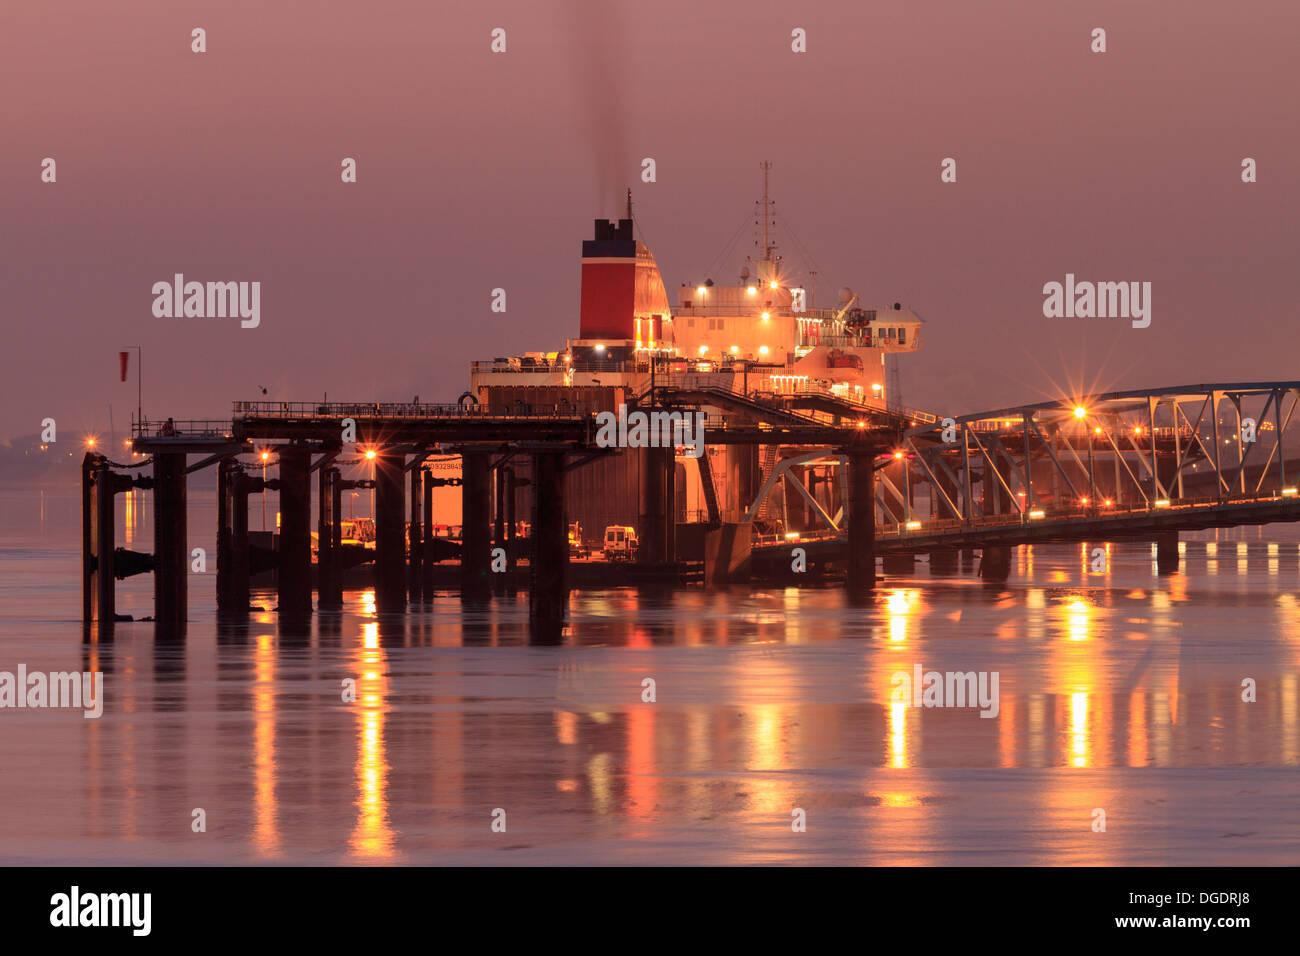 Liverpool ferry Birkenhead, Wirral - Stock Image